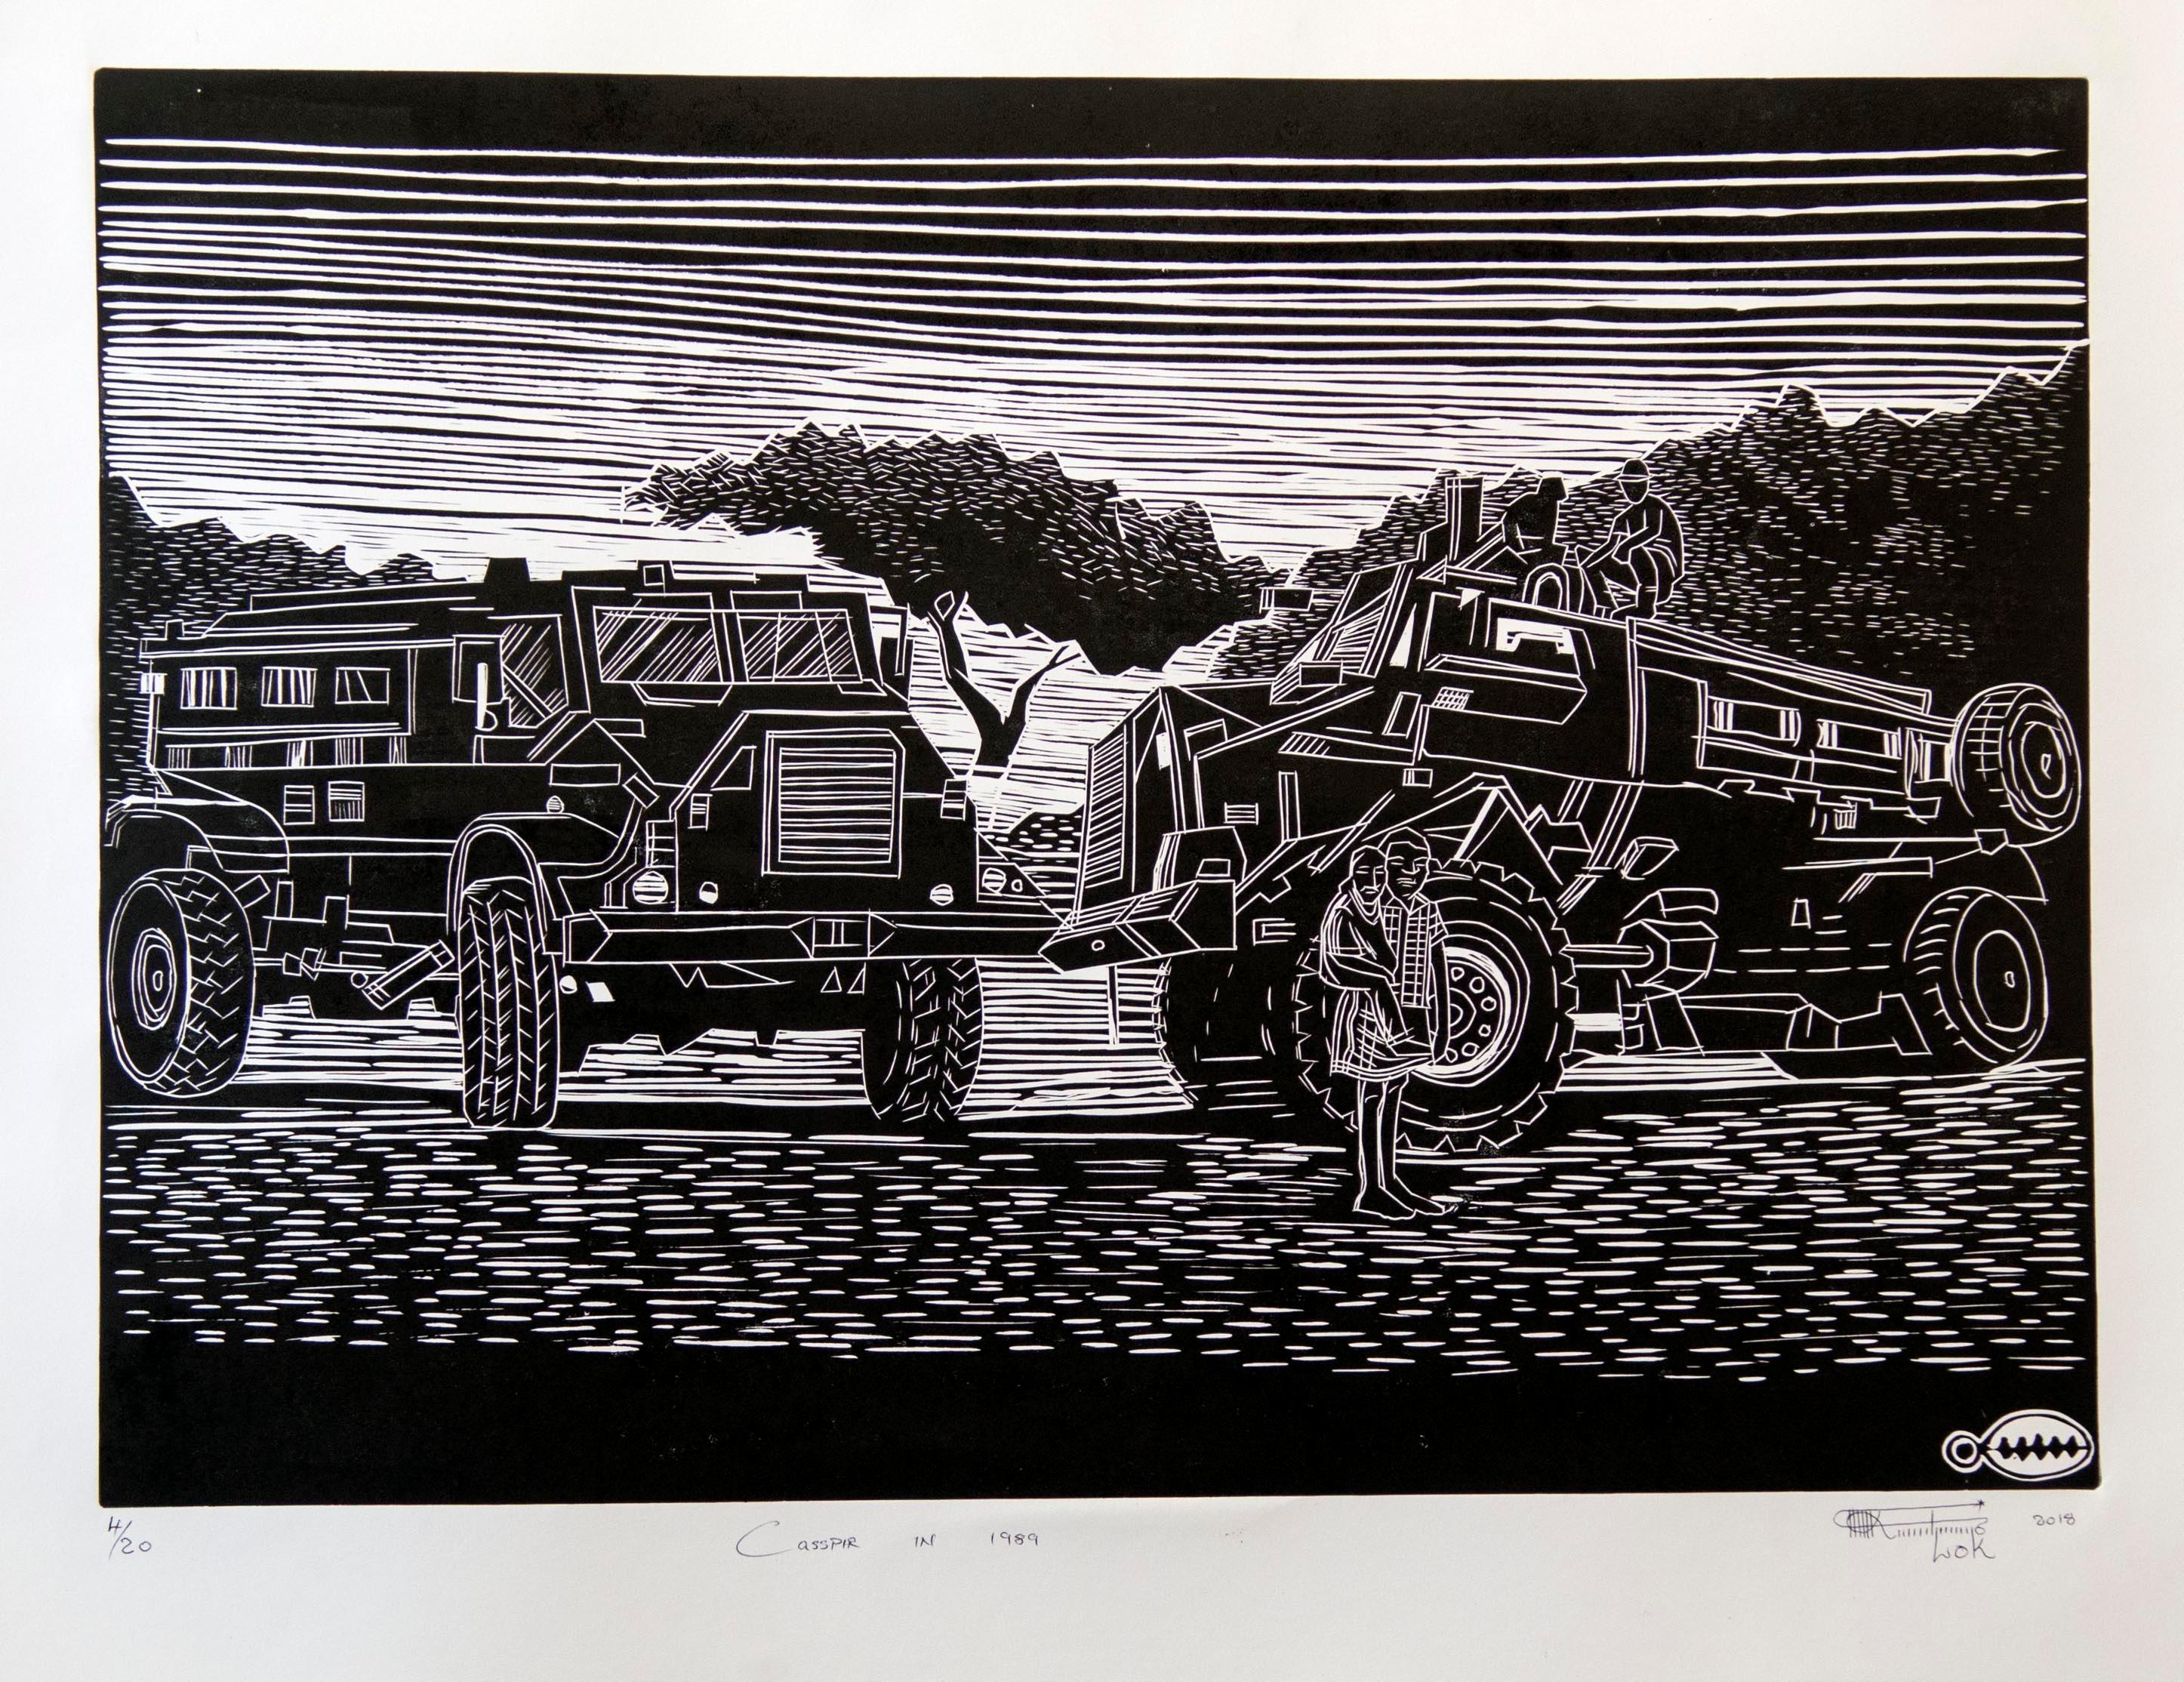 Casspir in 1989 (2018), Linoleum Block Print on Paper, 4/20, black and white